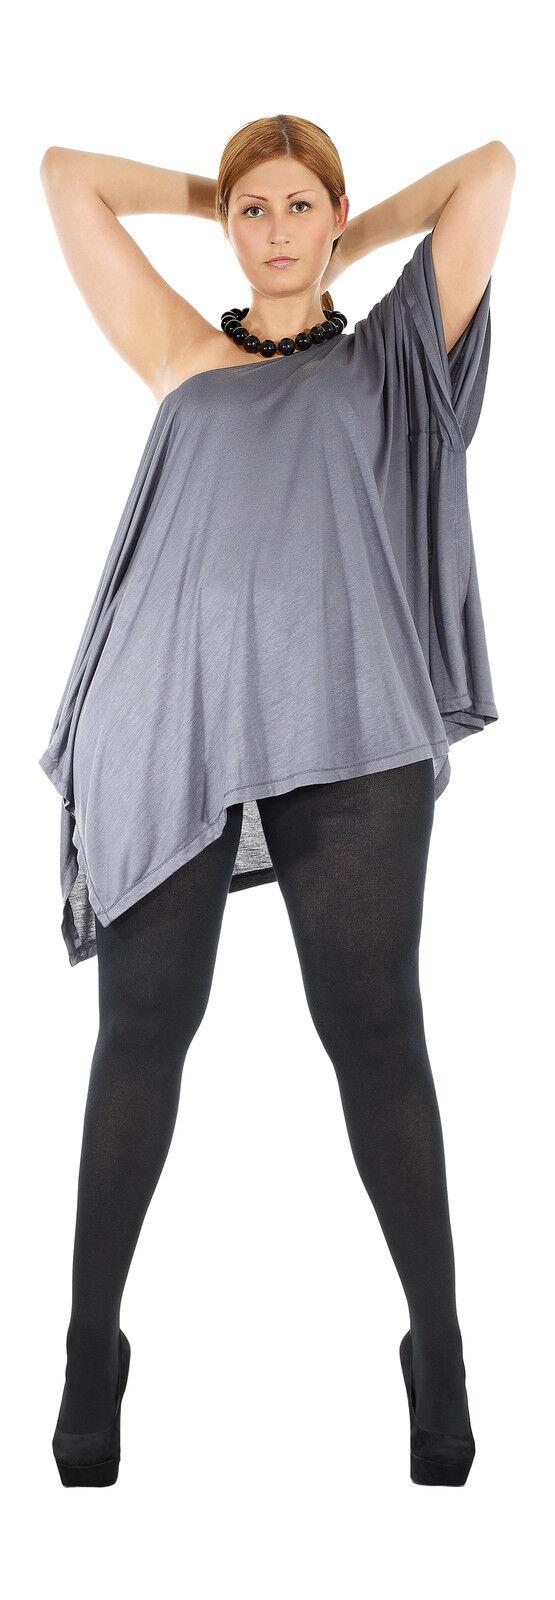 86587e9bafe Womens Girls Plus Size Opaque Fashion Warm Cotton Tights Hosiery ...